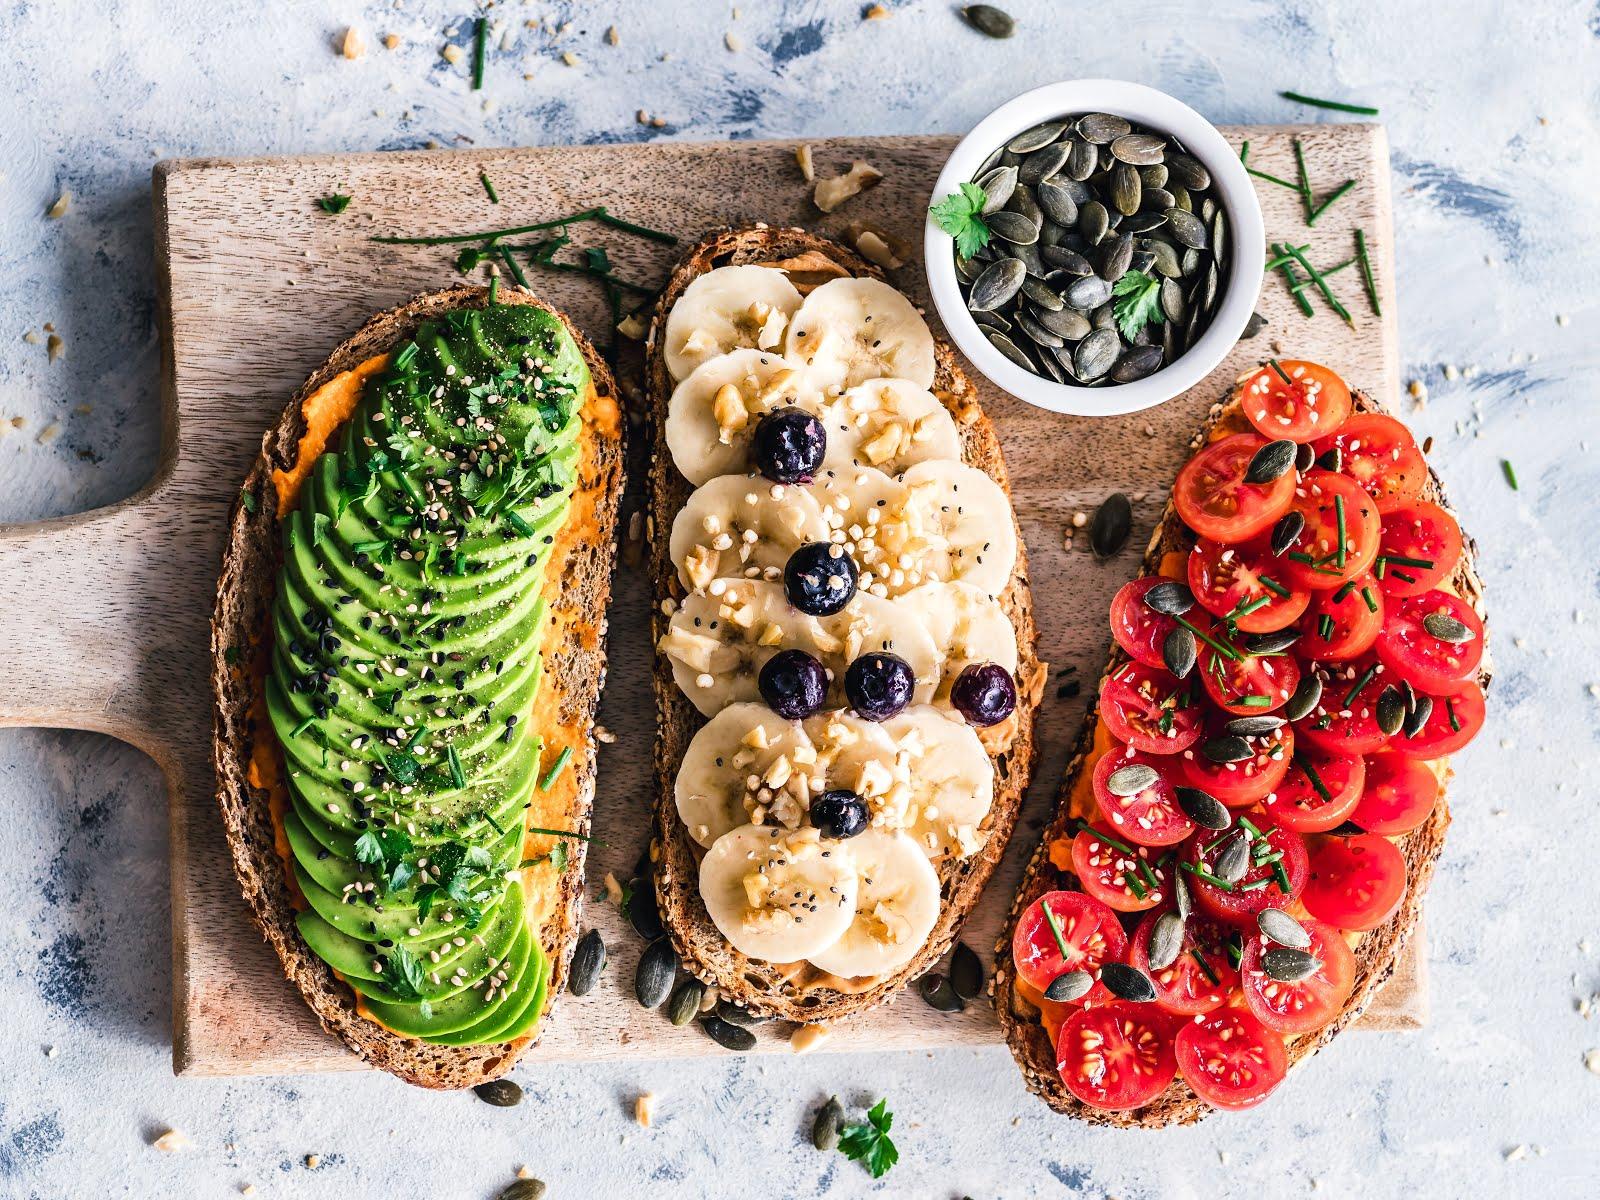 vegan cities food with avocado